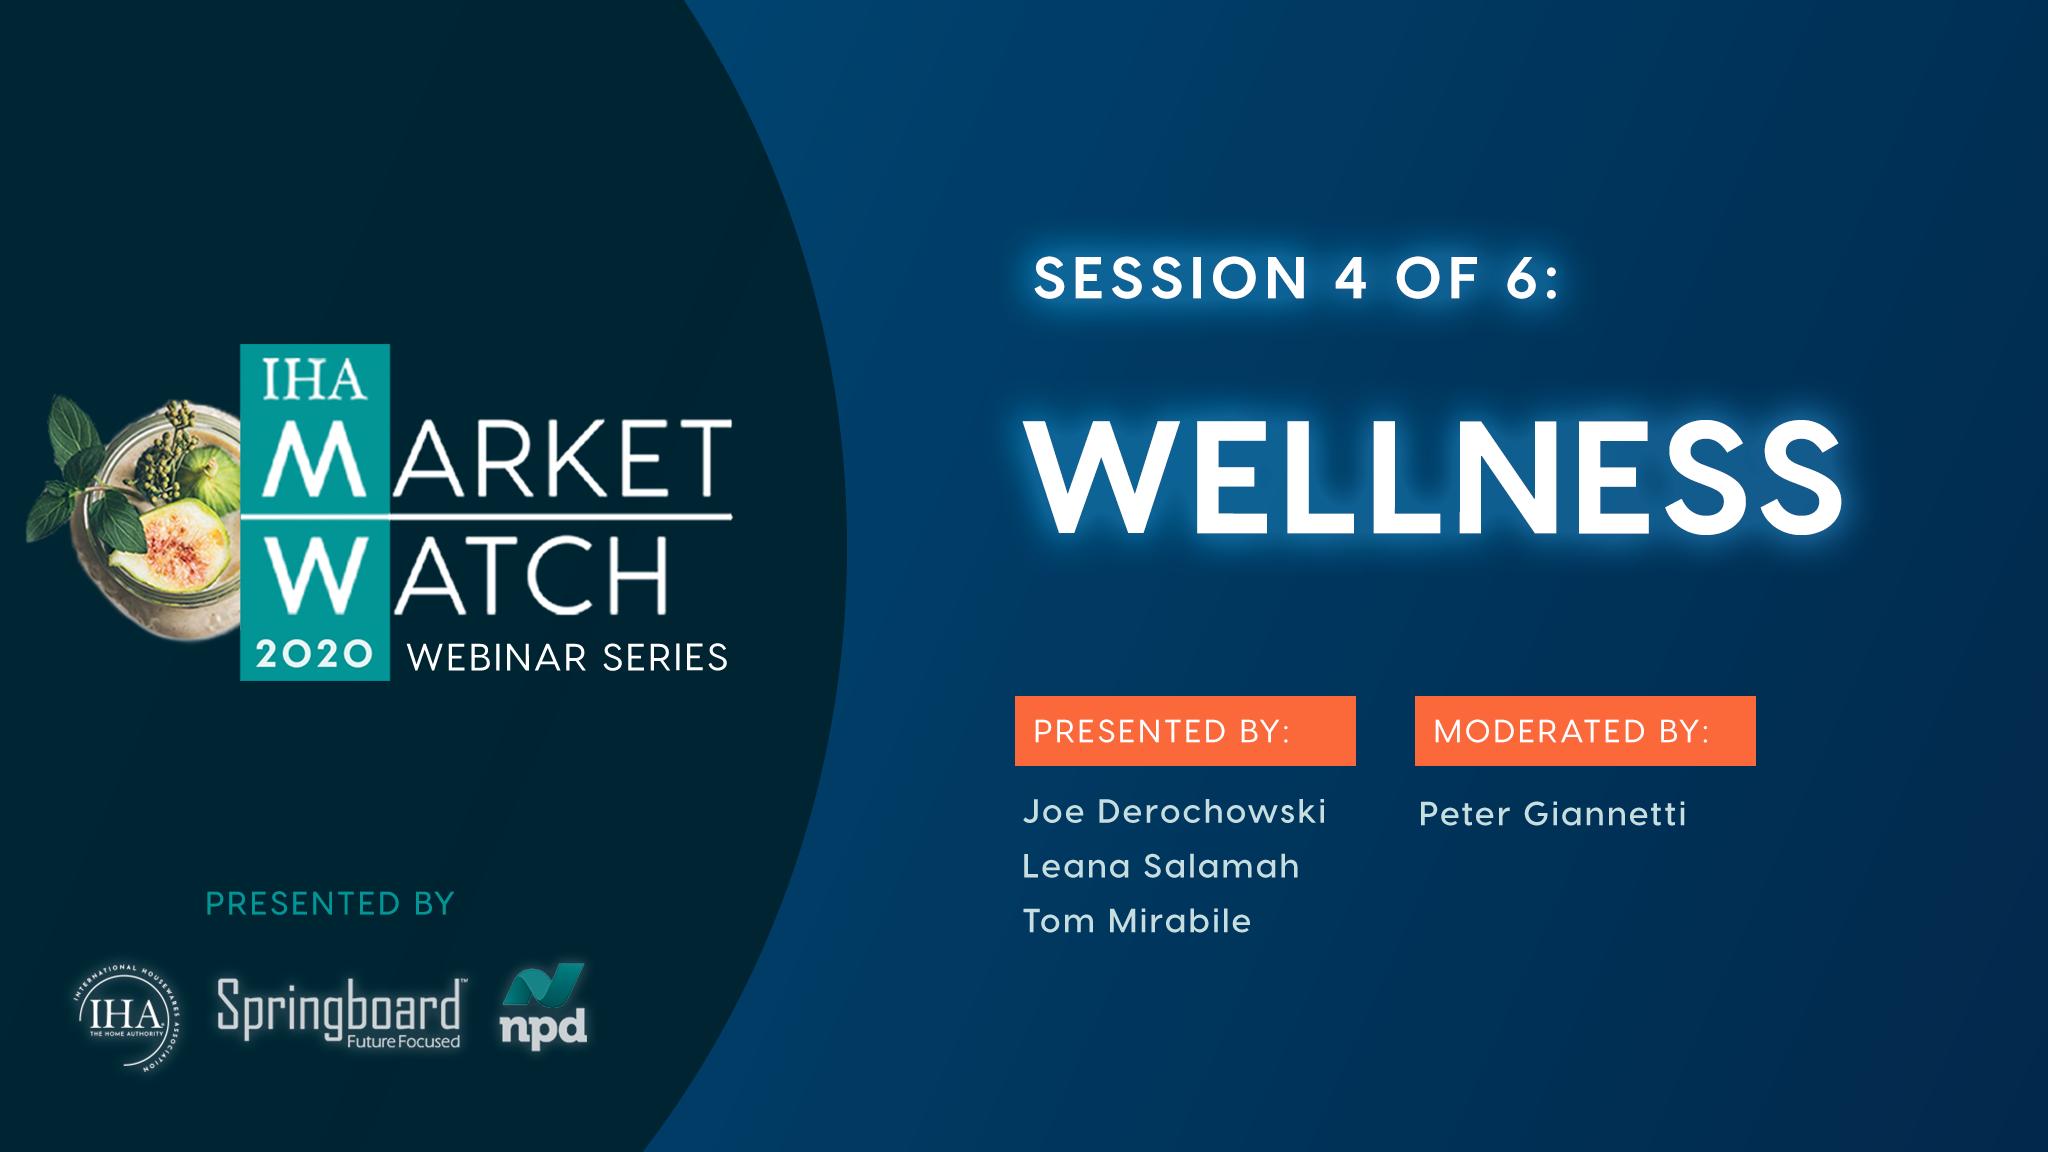 IHA Market Watch - Session 4 - Wellness